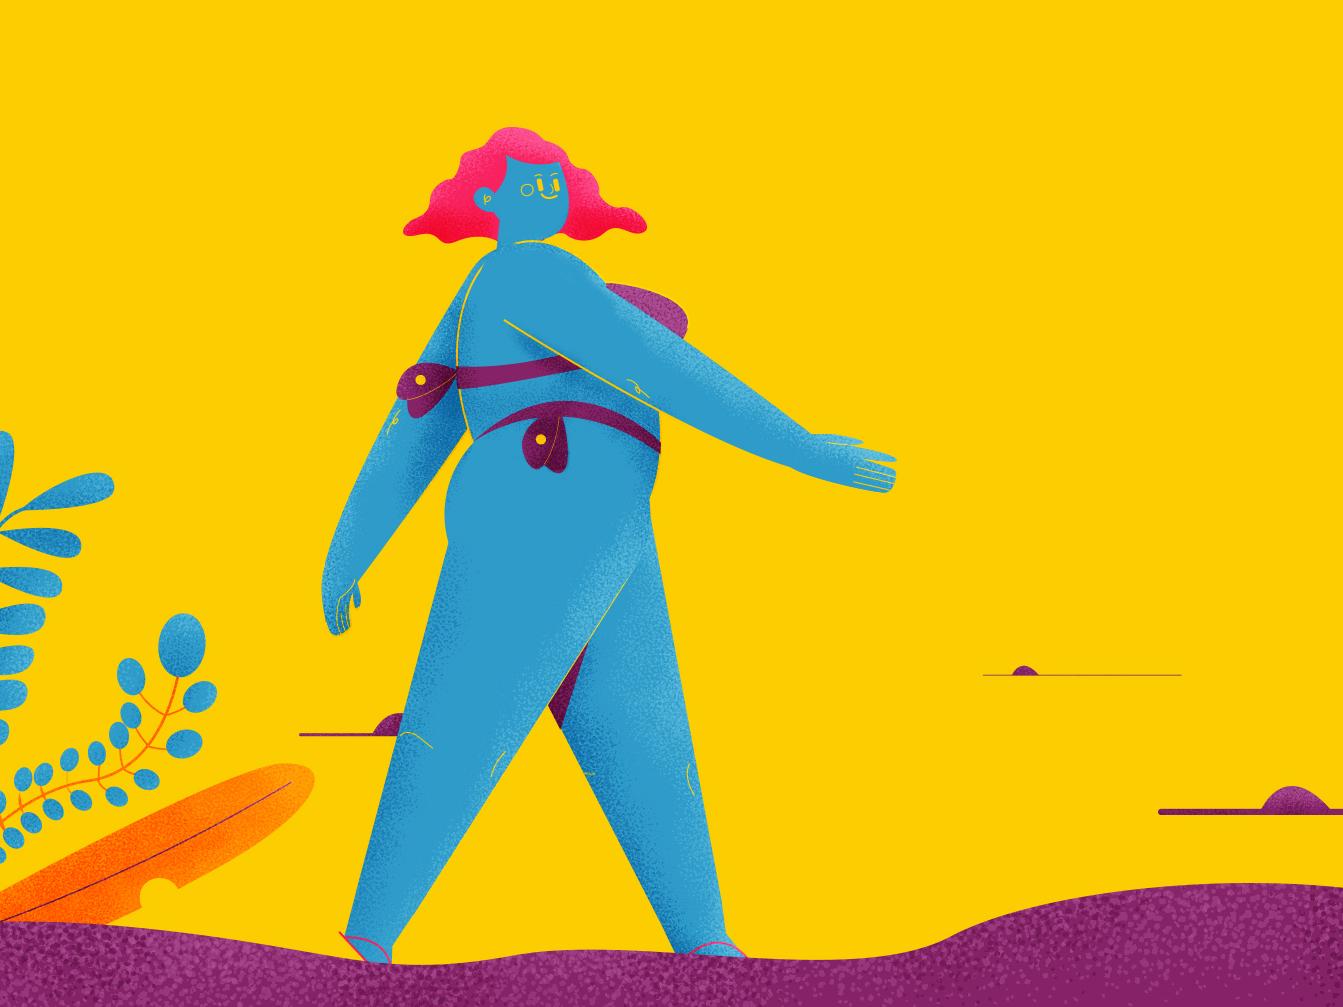 summer summer sun rise girl character vector beach brush character motion character concept abstact flat illustration design charactedesign animation art animation 2d